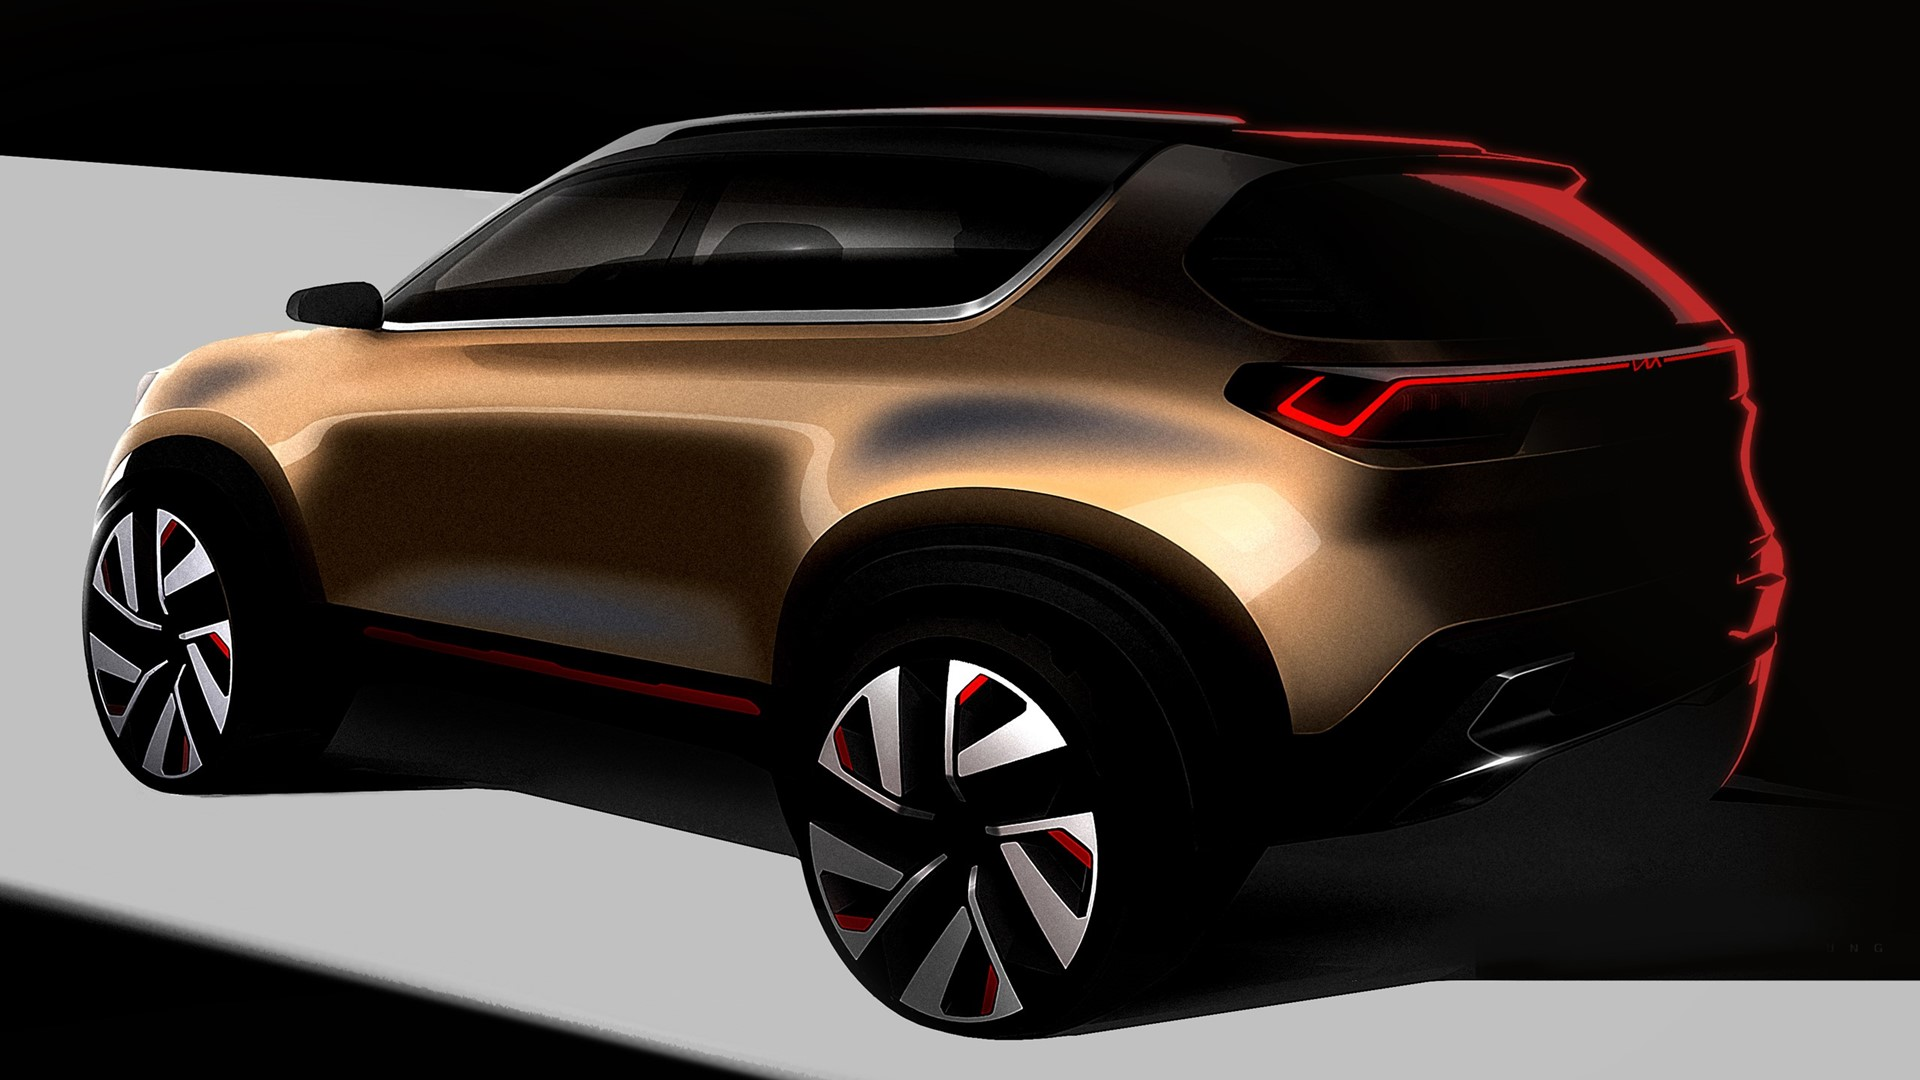 Kia Motors India shares a sneak peek of its compact SUV concept - Image 1